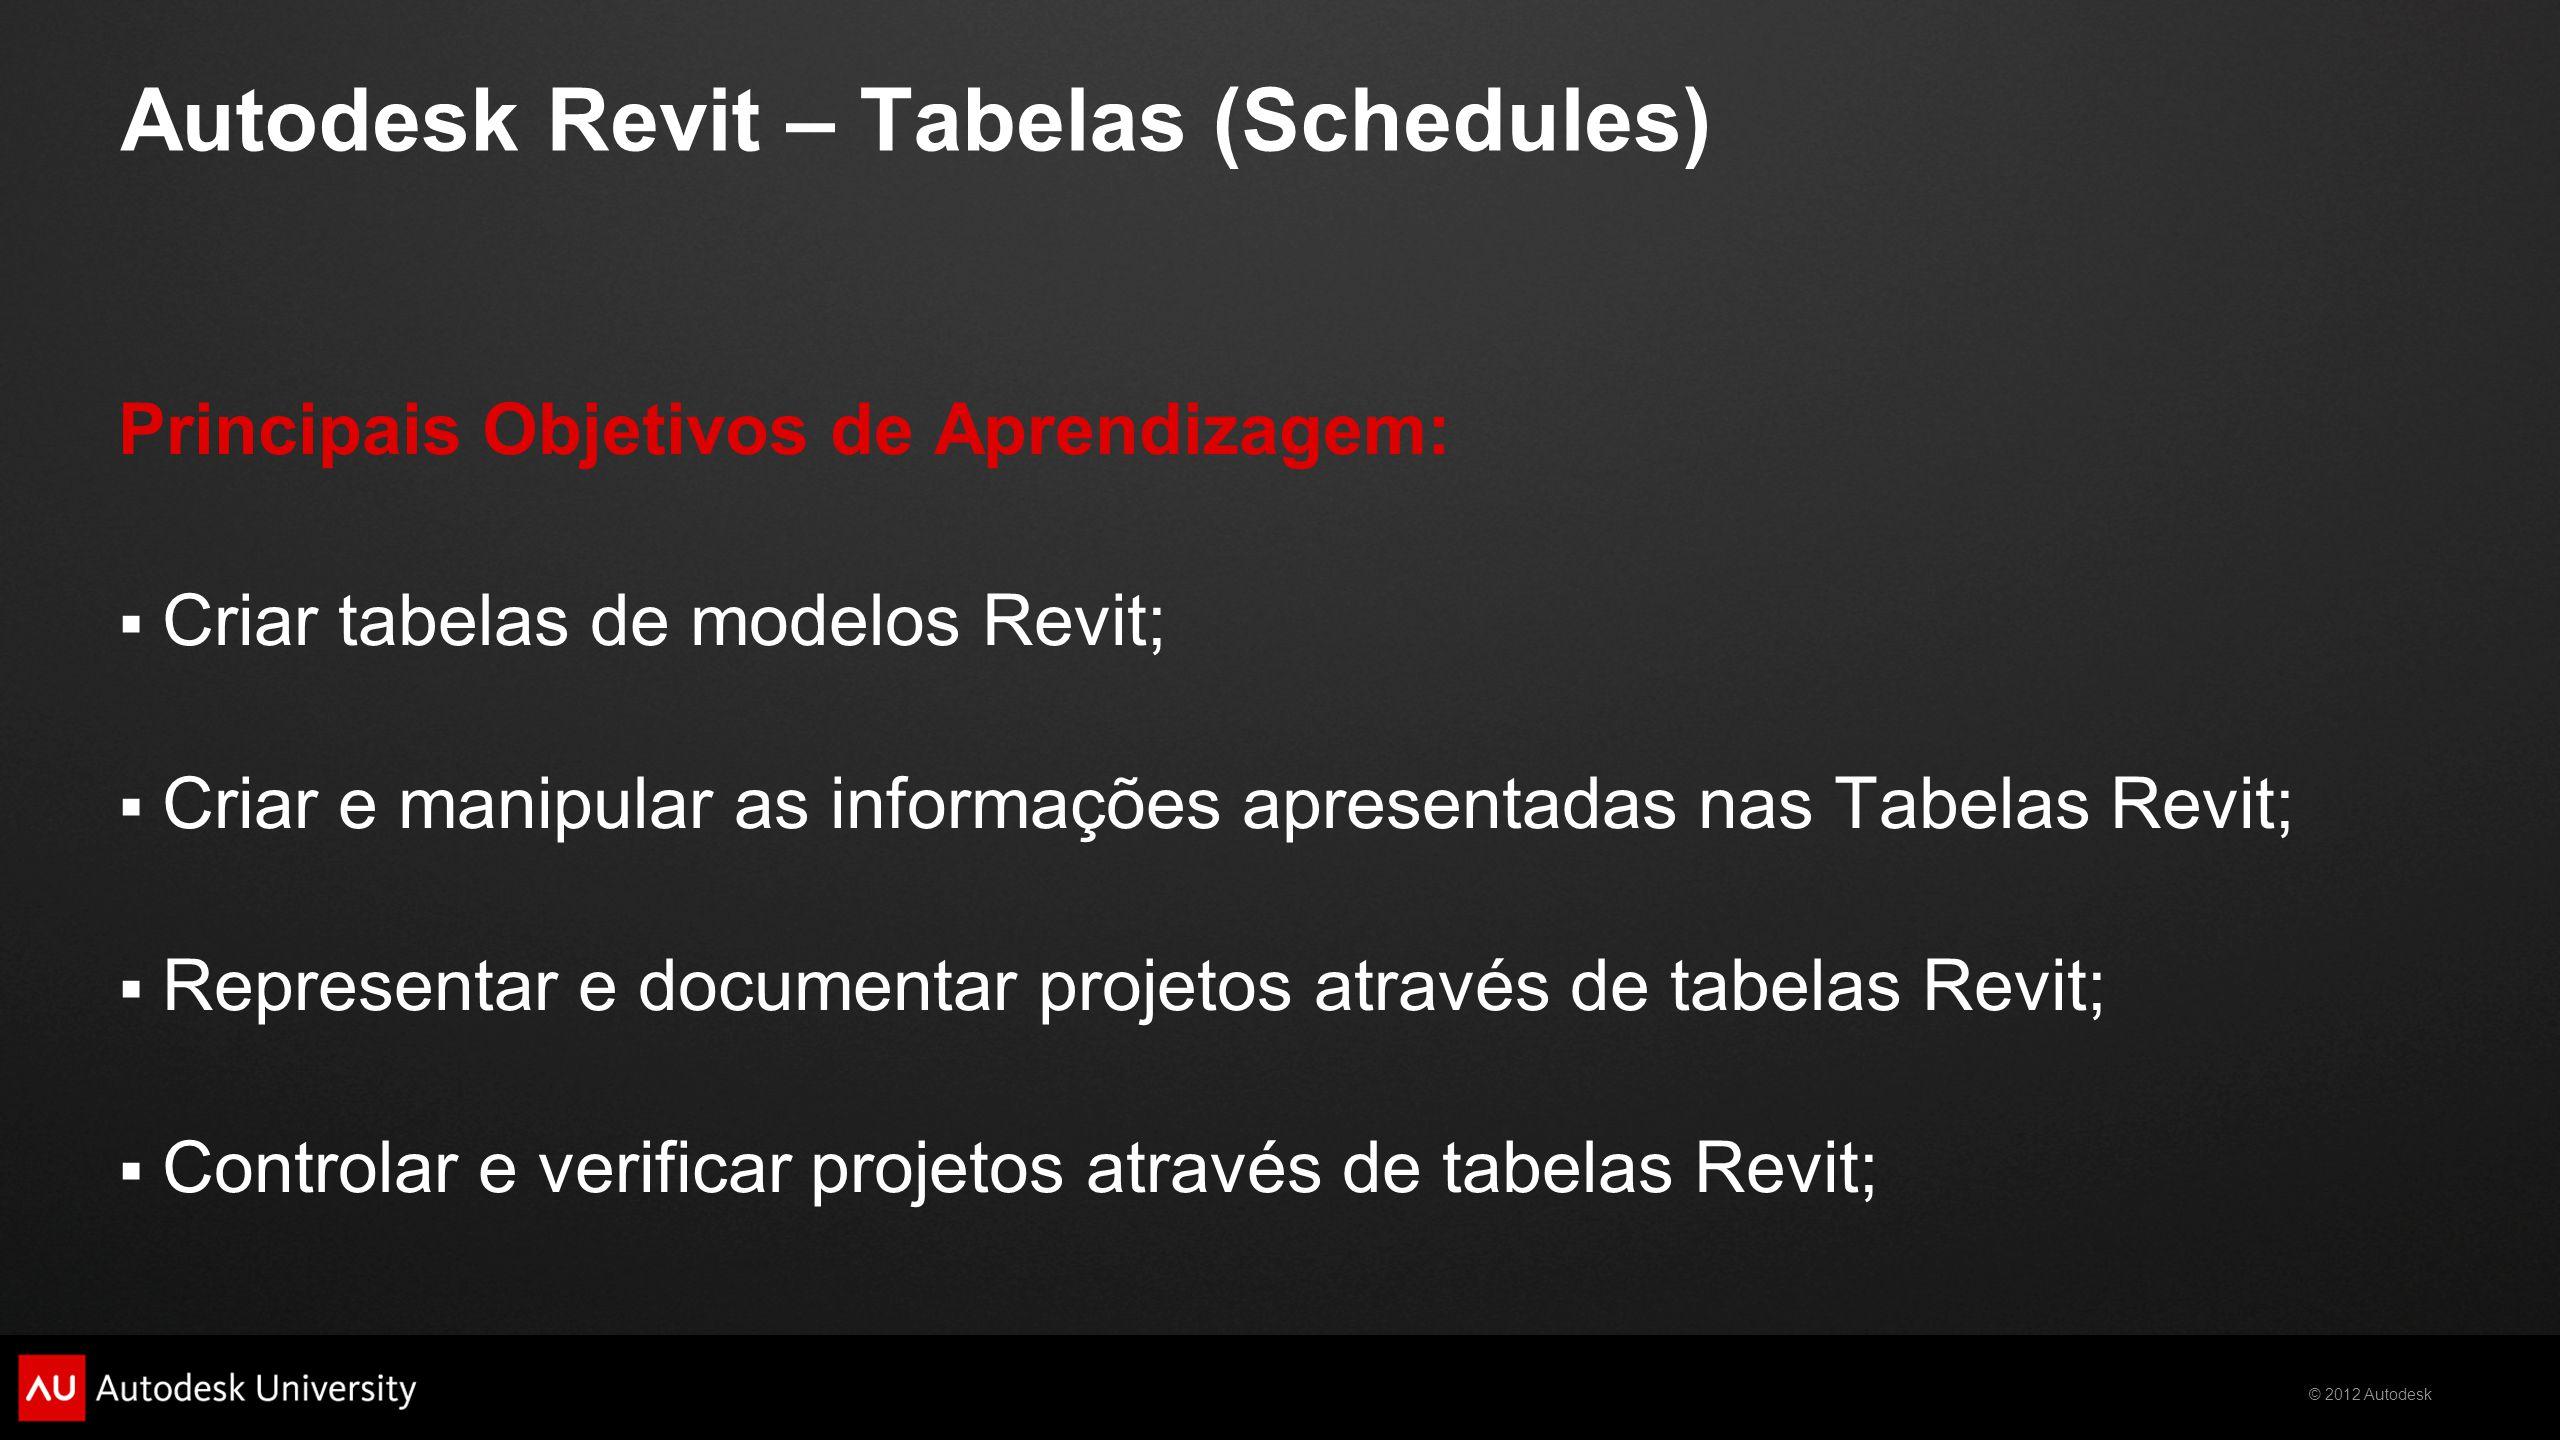 © 2012 Autodesk Autodesk Revit – Tabelas (Schedules) Tab Sorting/Grouping